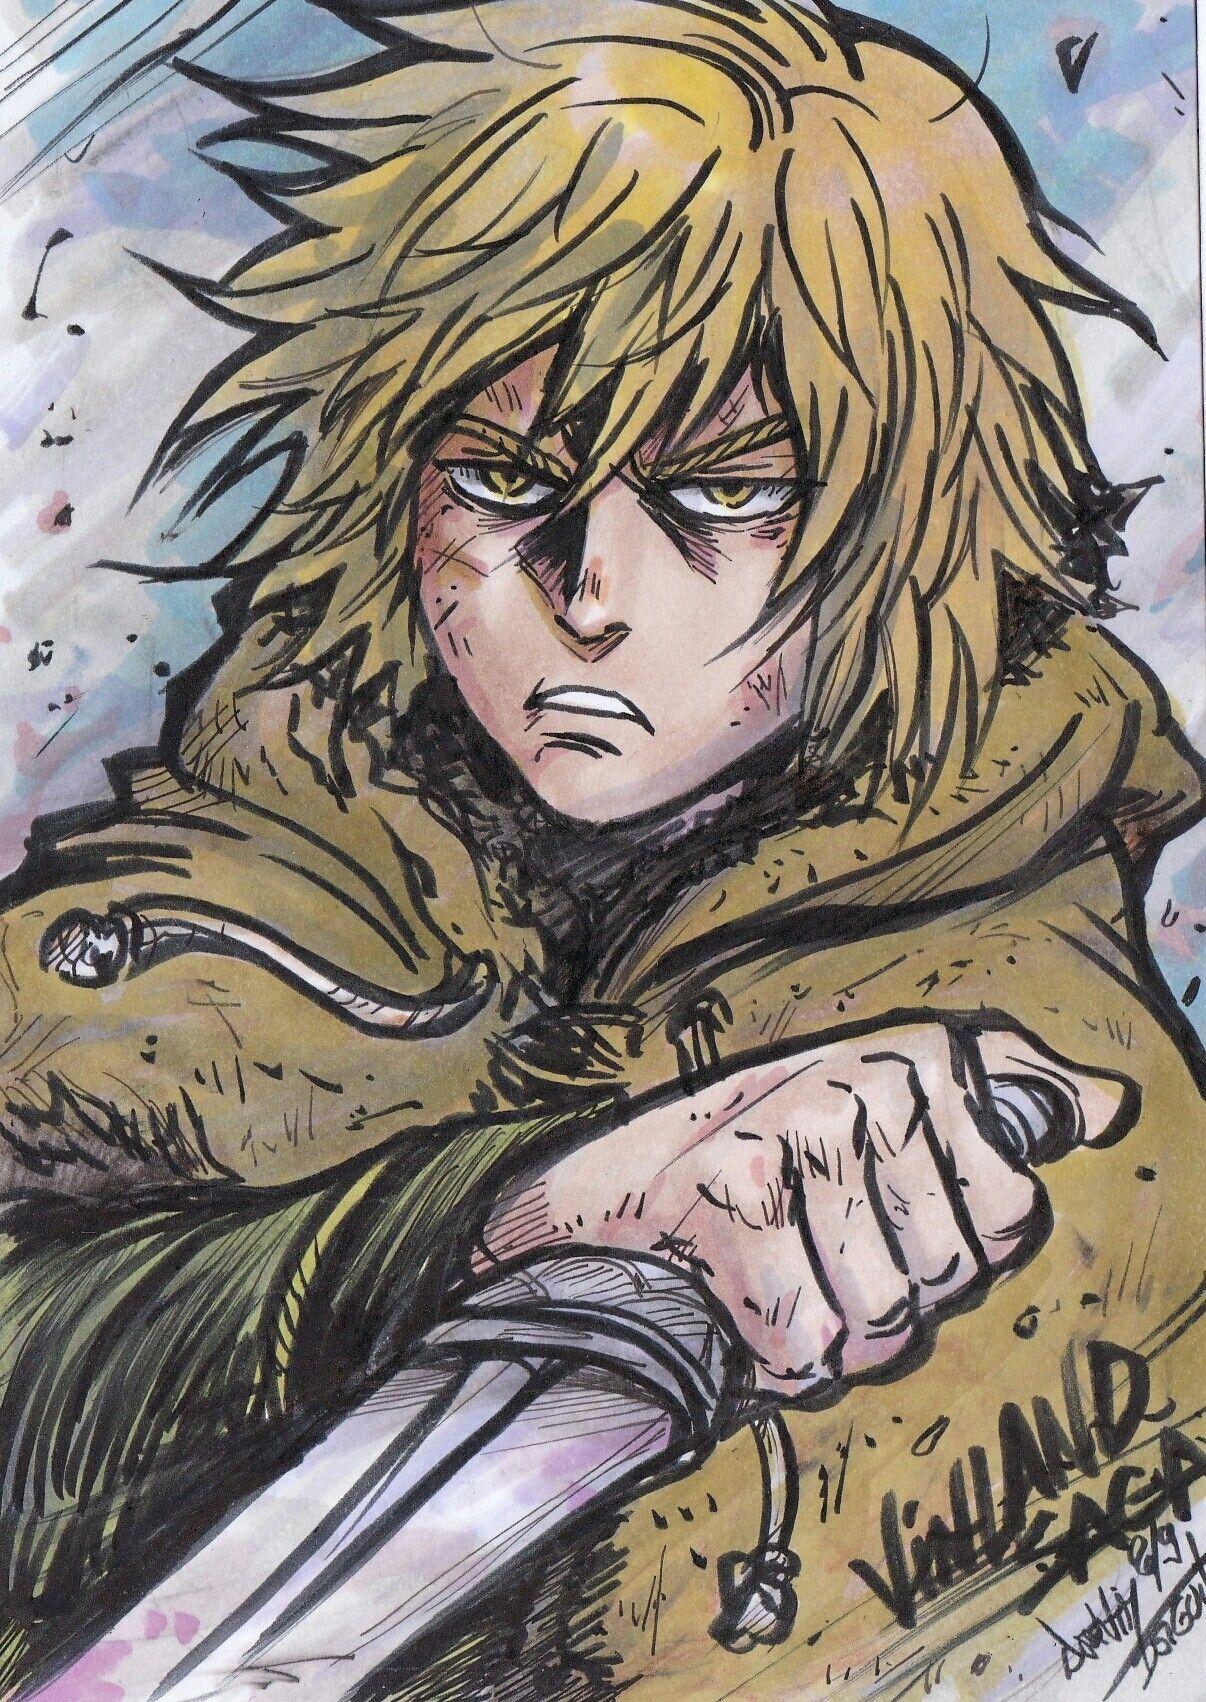 Ideia por Read Manga Season 🔥🔥 em vinland saga em 2020